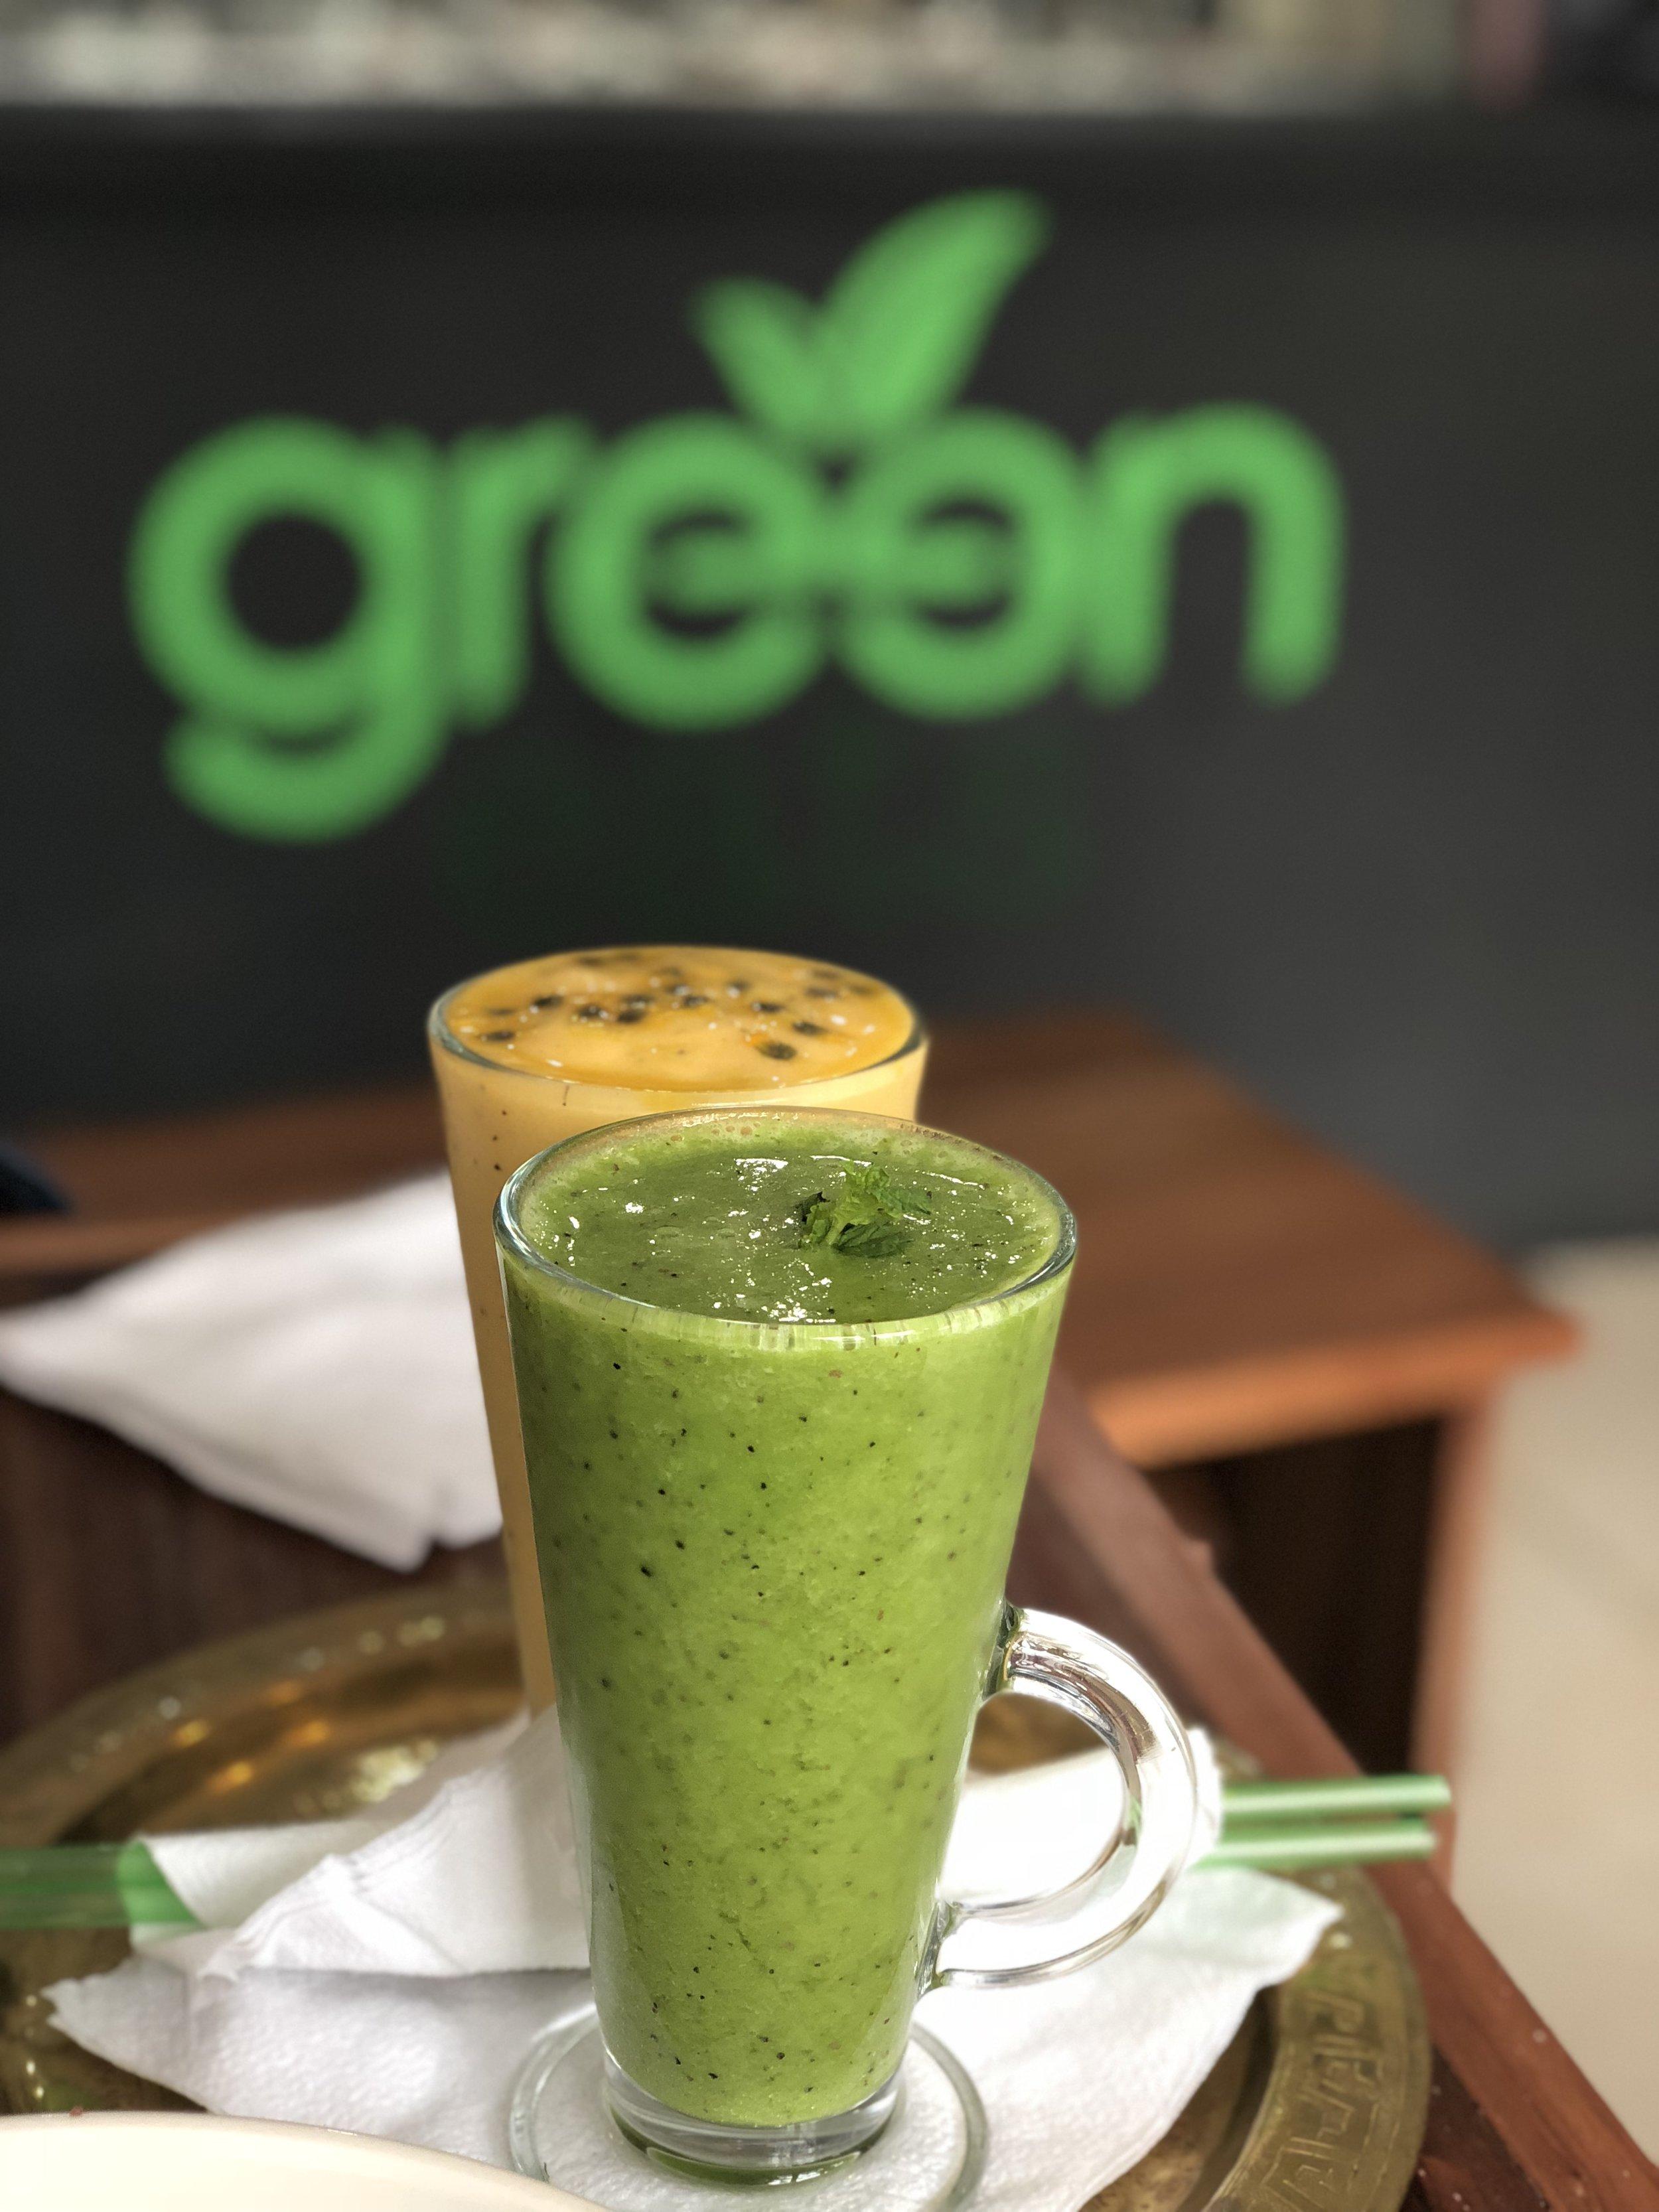 Mango Passions & Eve's Temptation, Green Eats